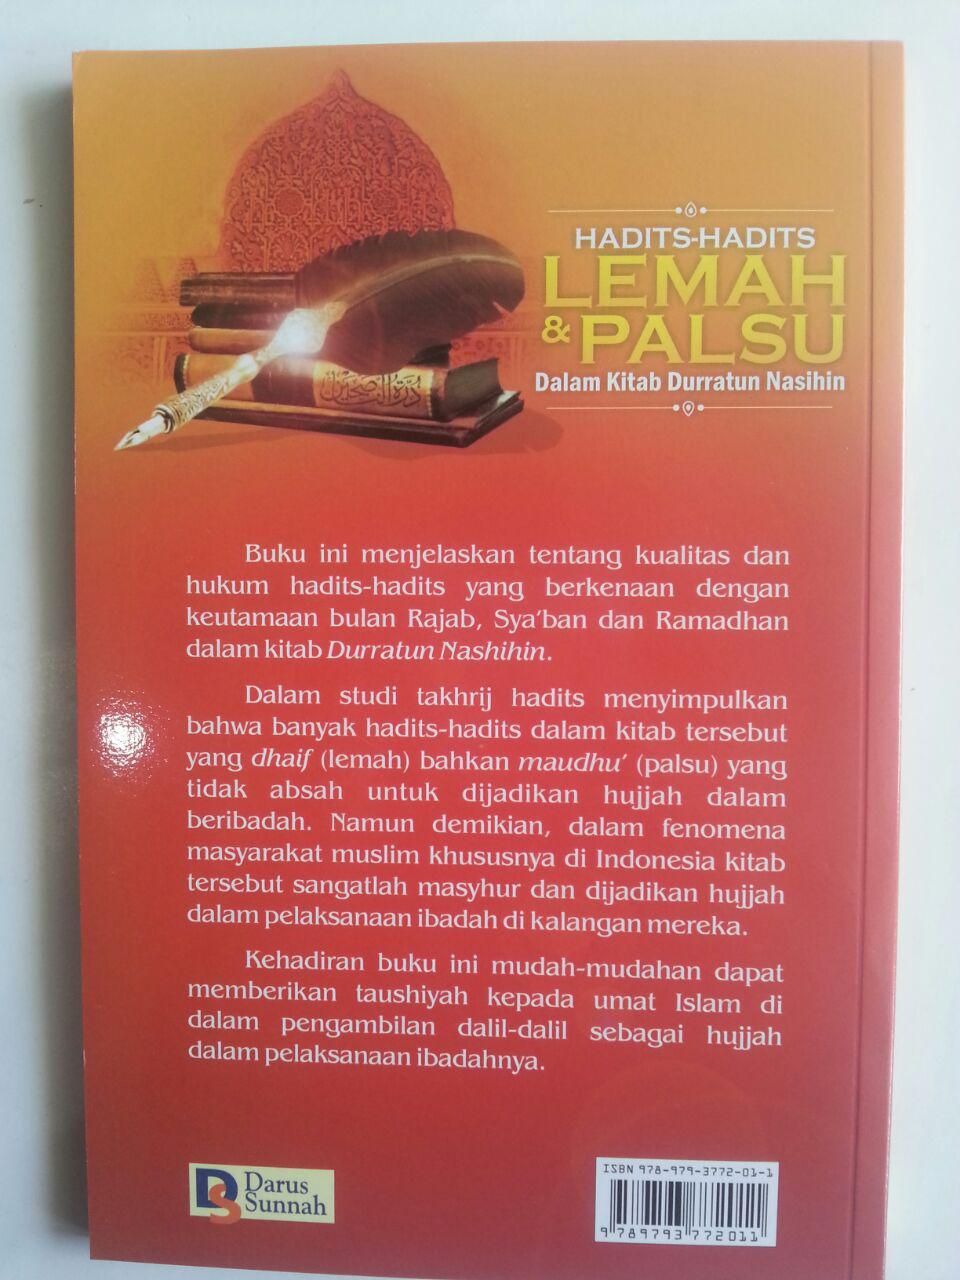 Buku Hadits-Hadits Lemah Dan Palsu Dalam Kitab Durratun Nasihin cover